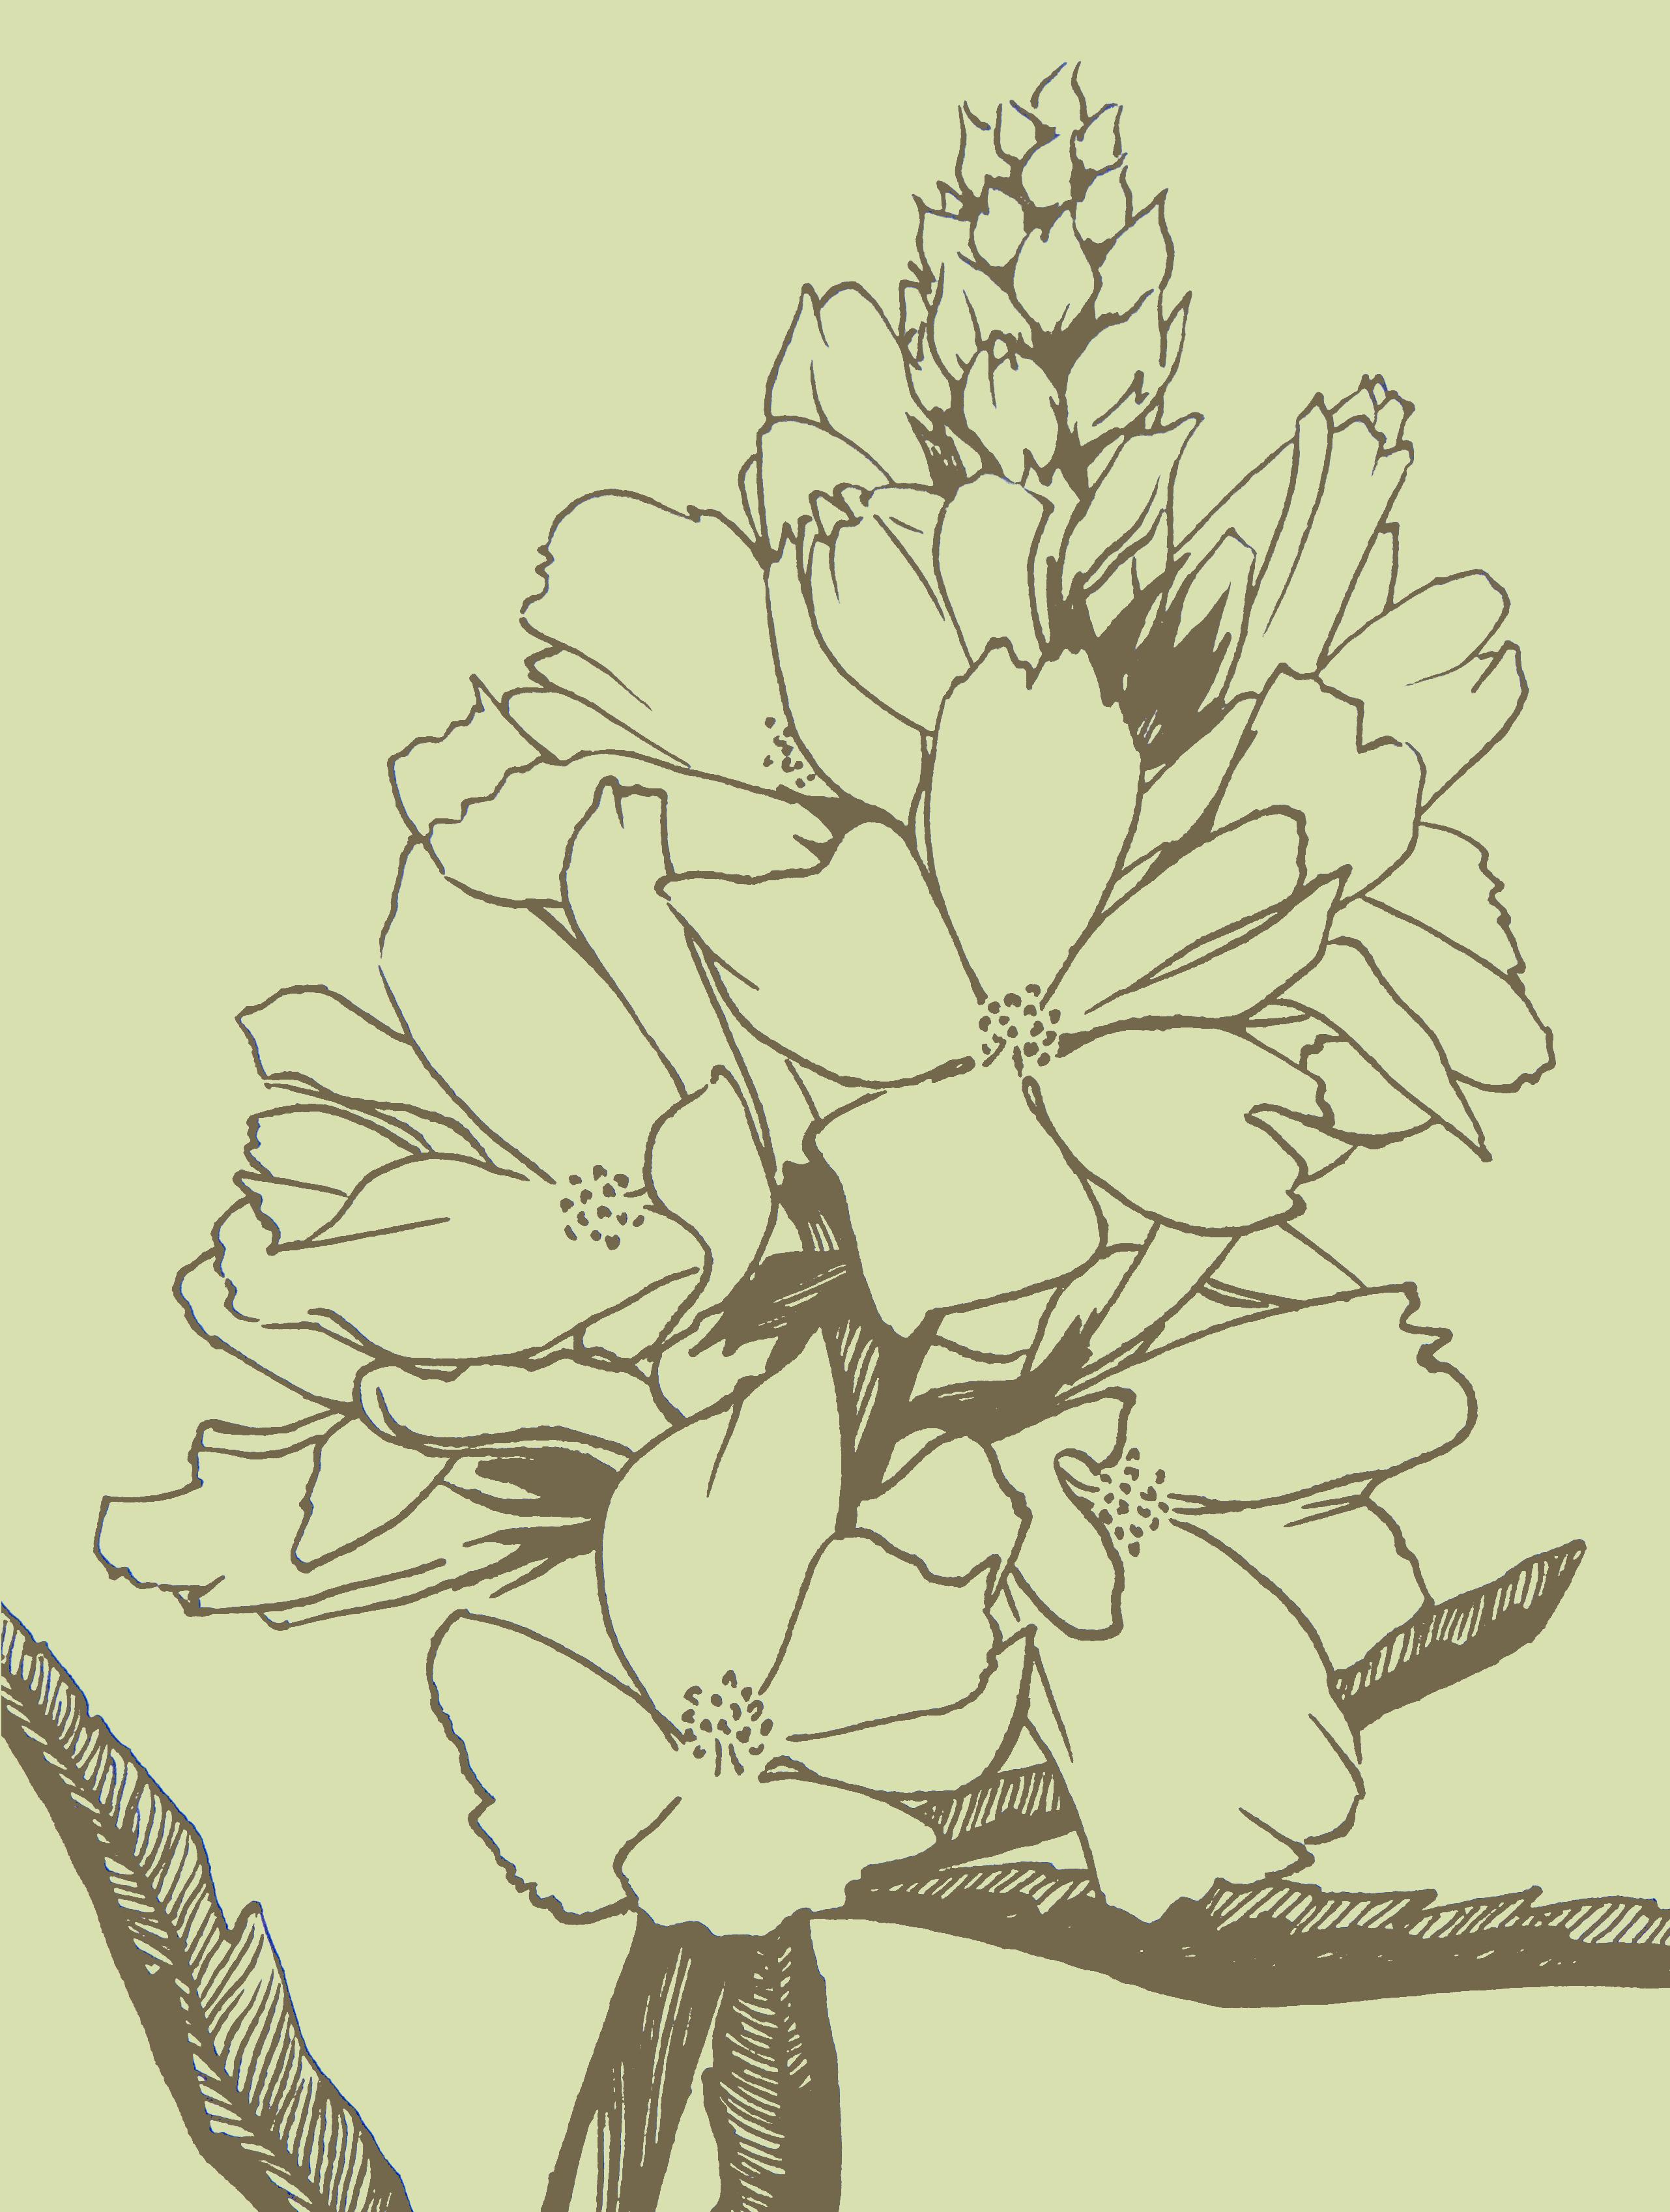 sidalcea image